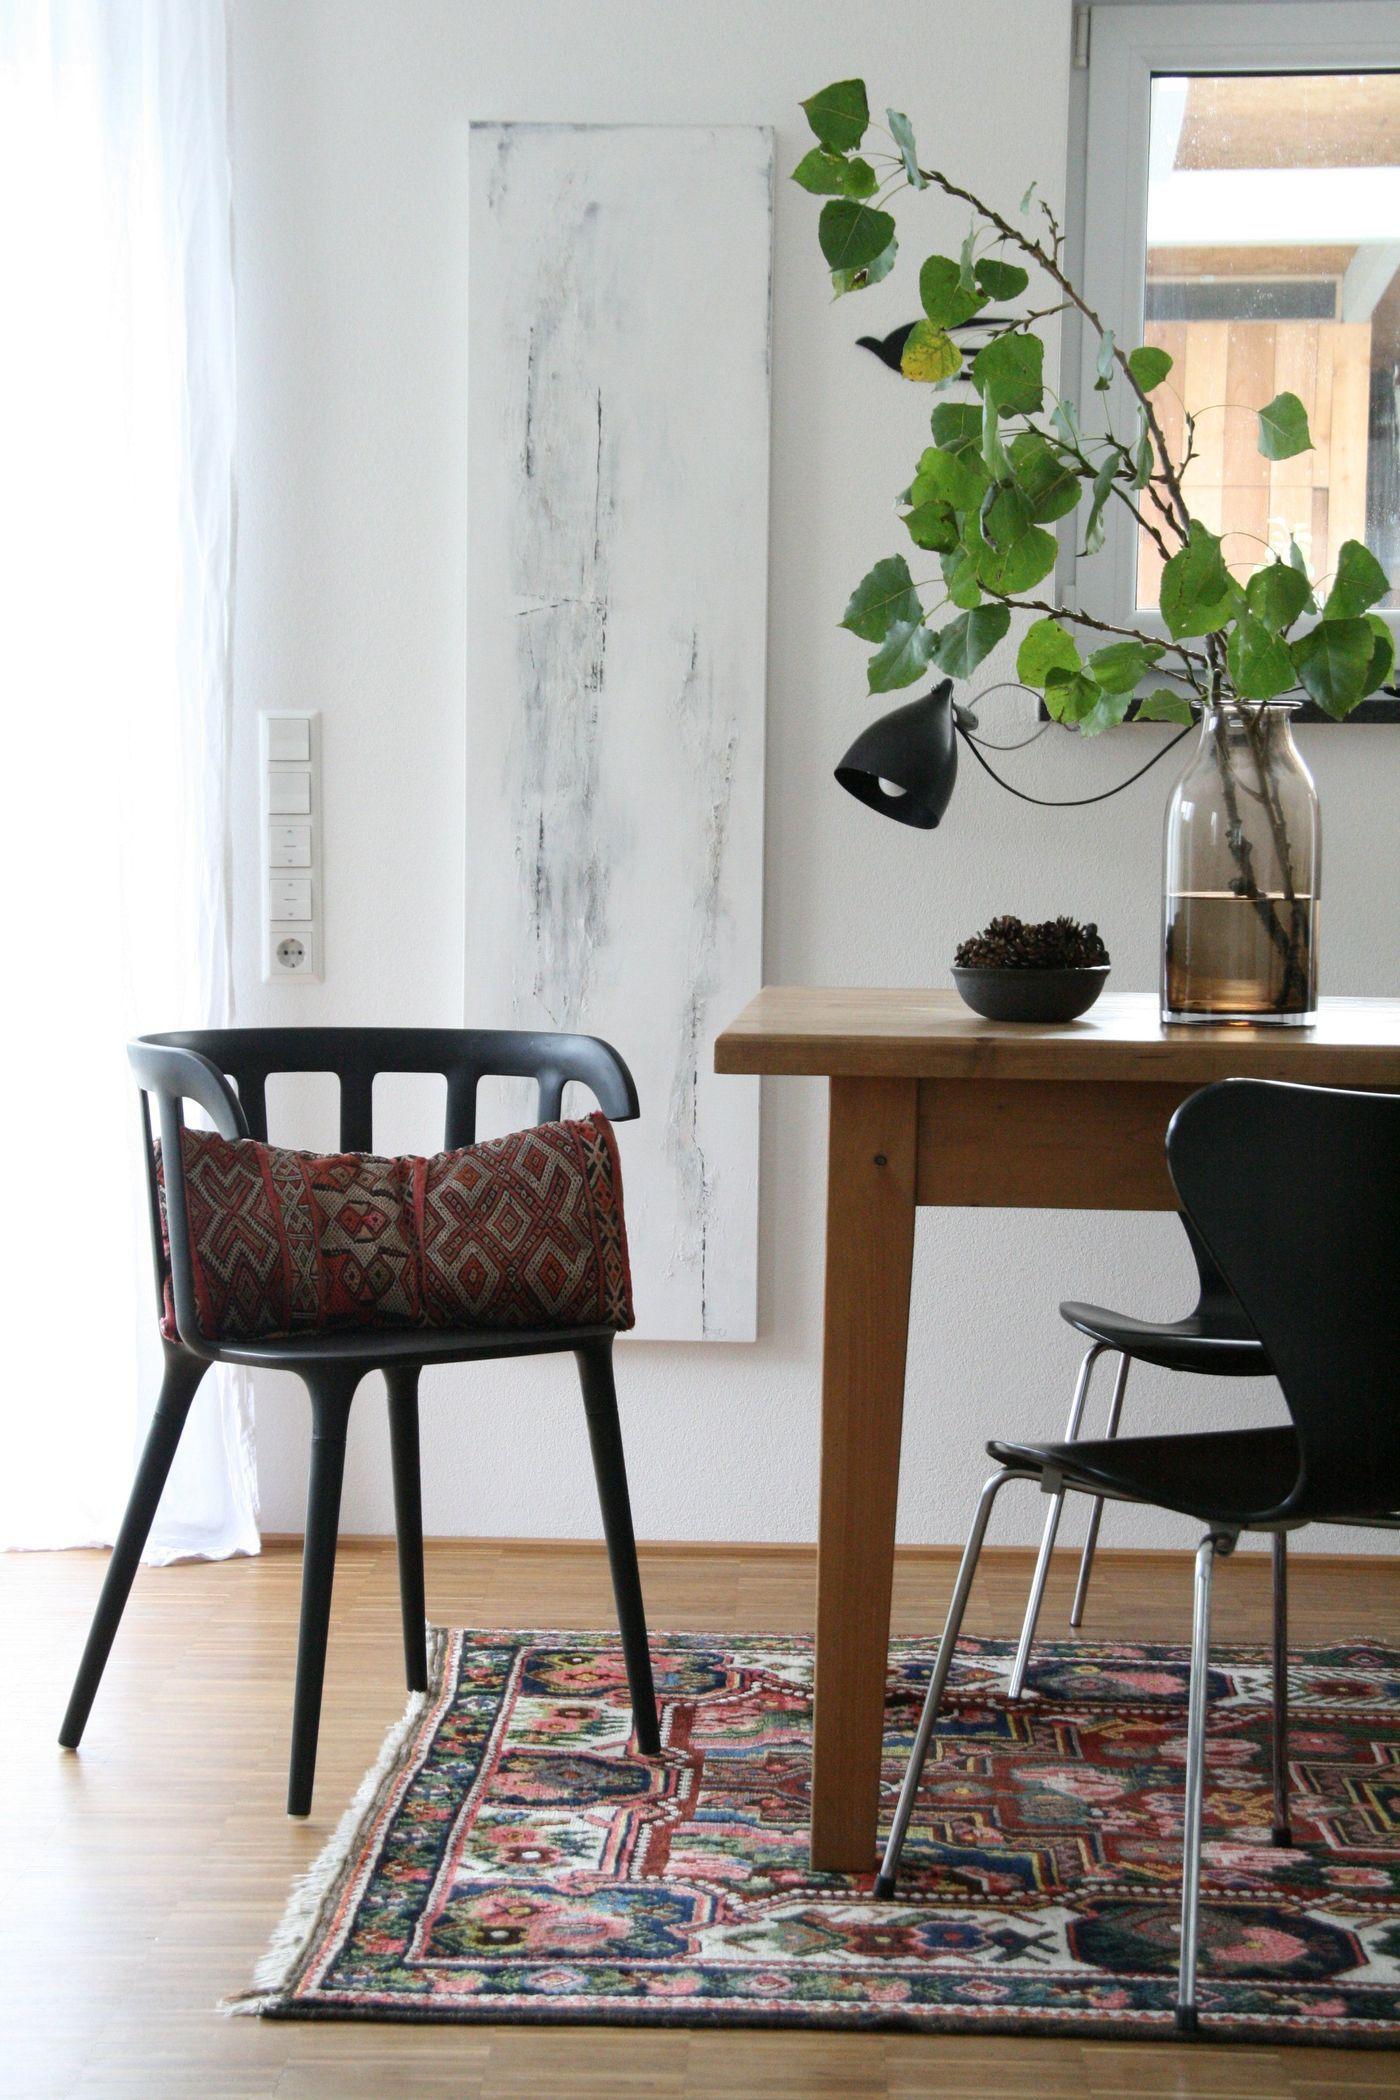 m bel von arne jacobsen seite 2. Black Bedroom Furniture Sets. Home Design Ideas